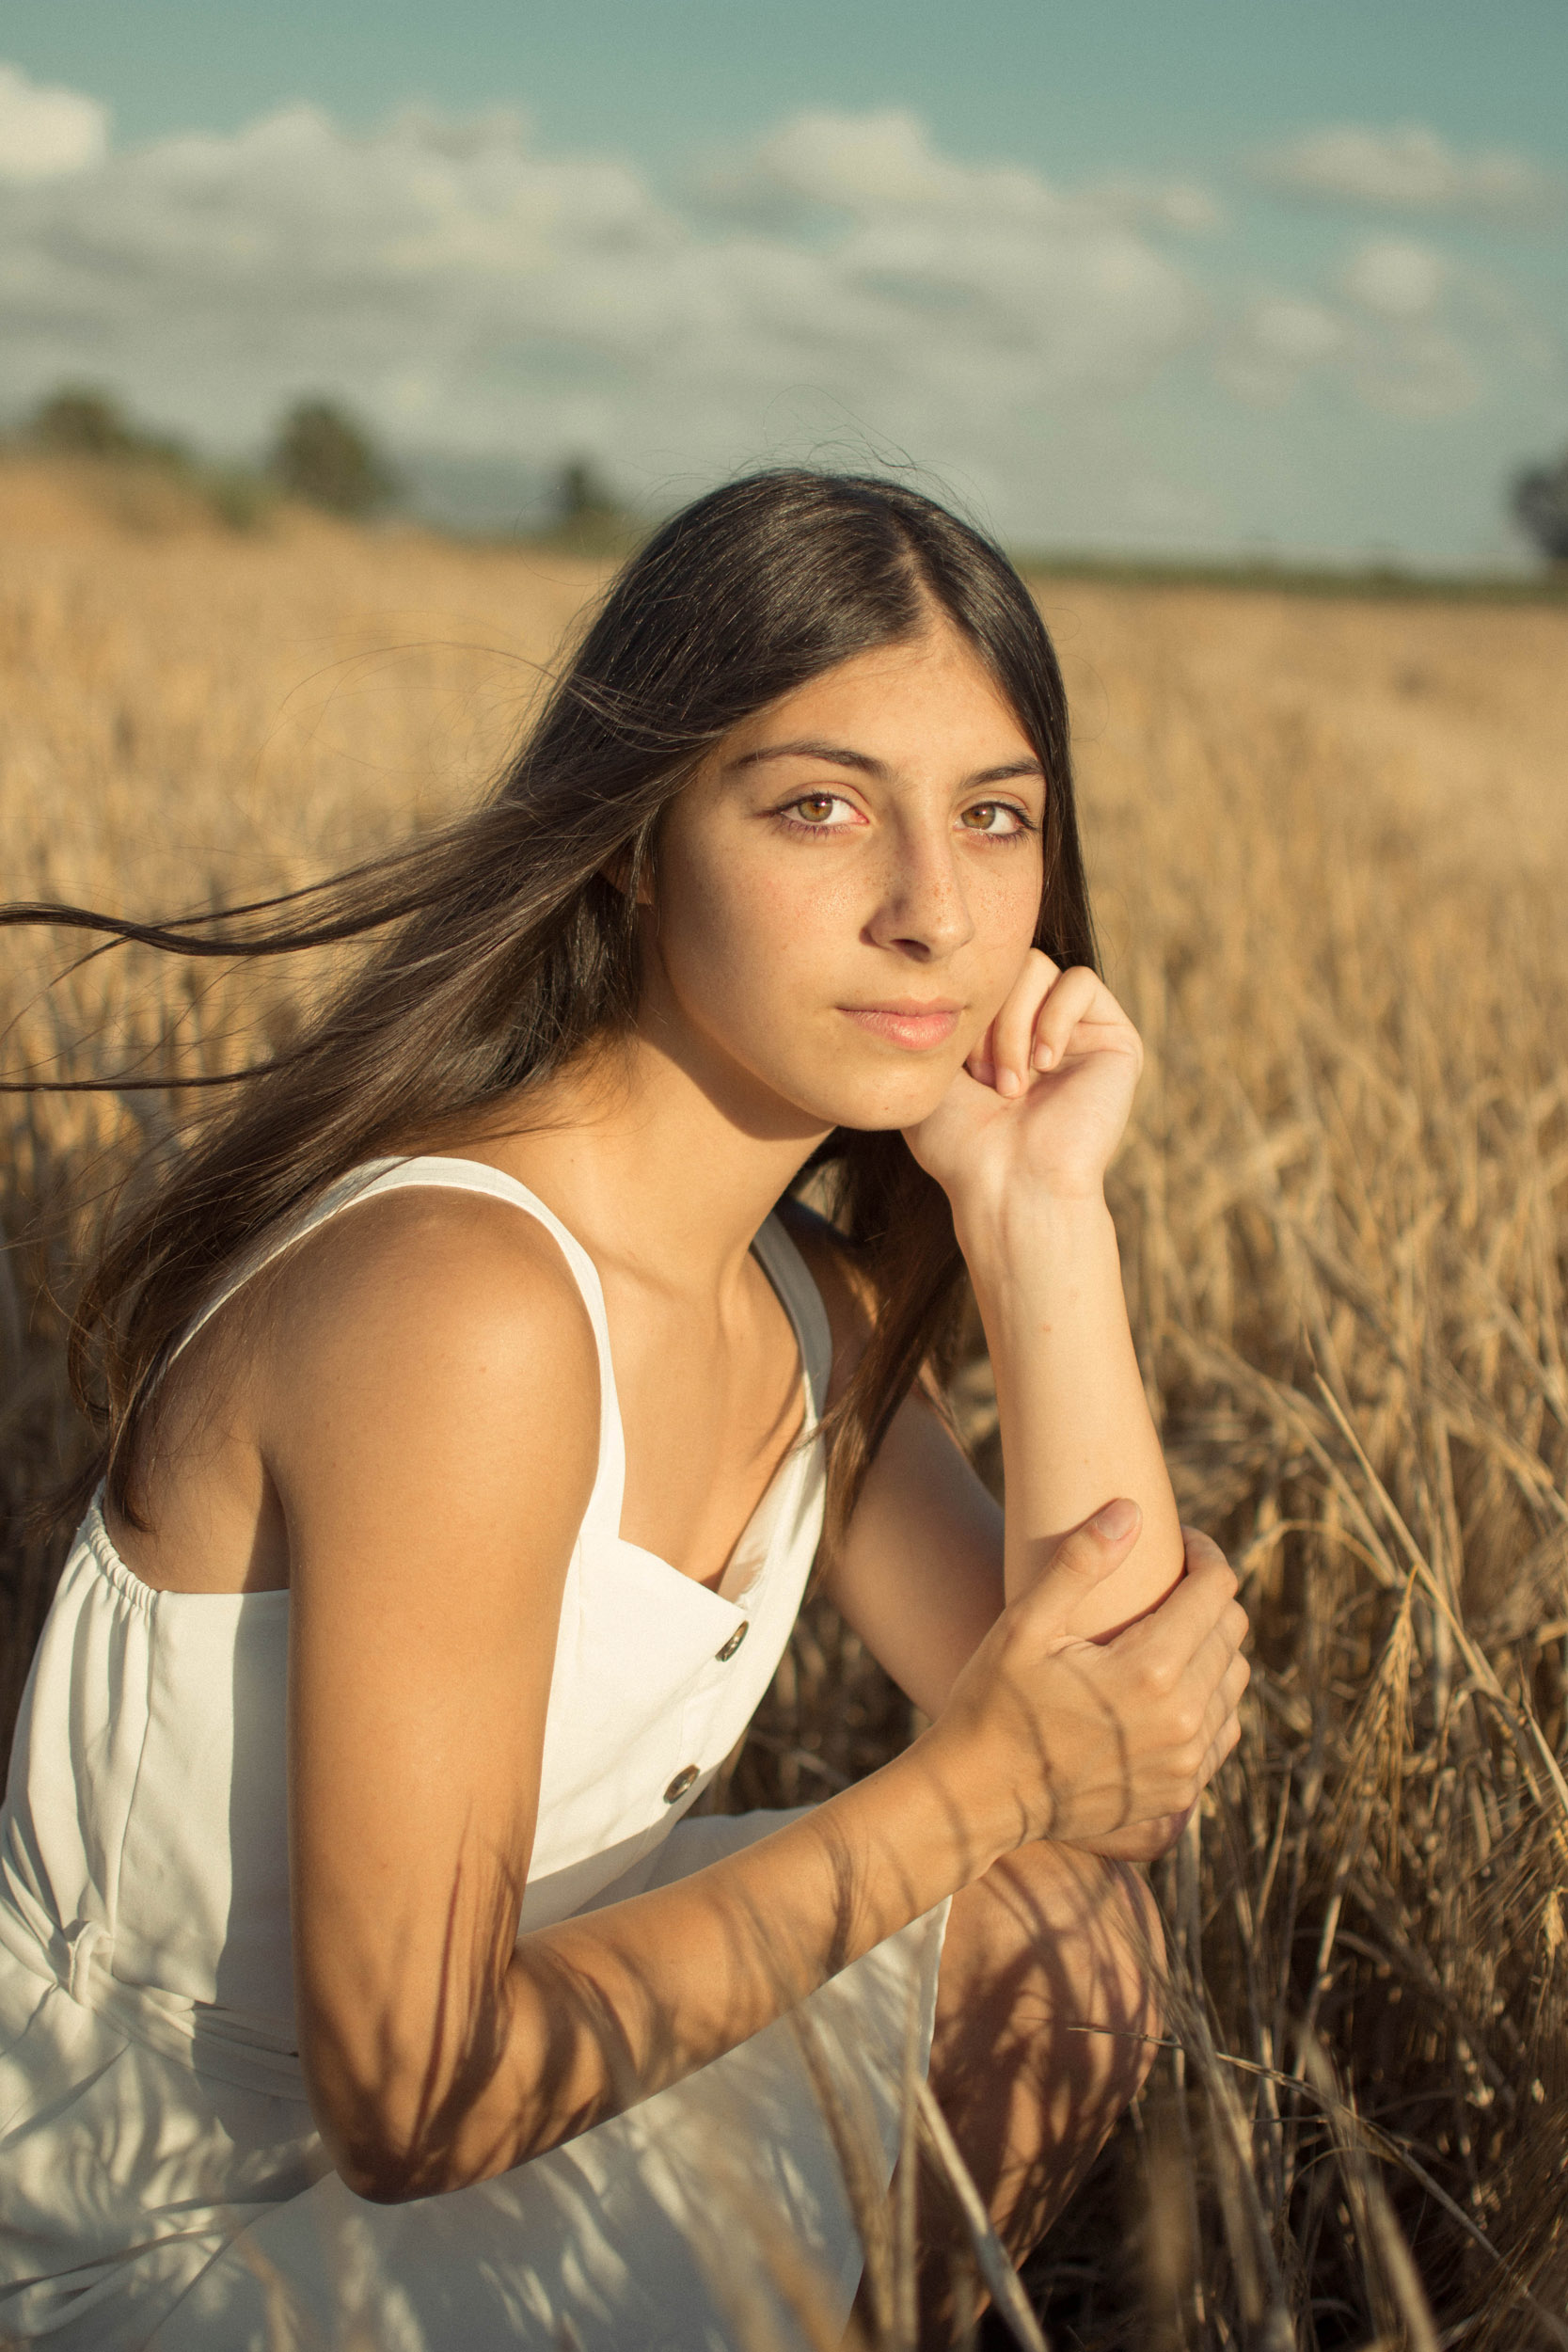 Categorie: Glamour, Portrait - Photographer: VALERIA DE RISO; Model: ALISIA LEMMINI; - Location: Baia Domizia, CE, Italia